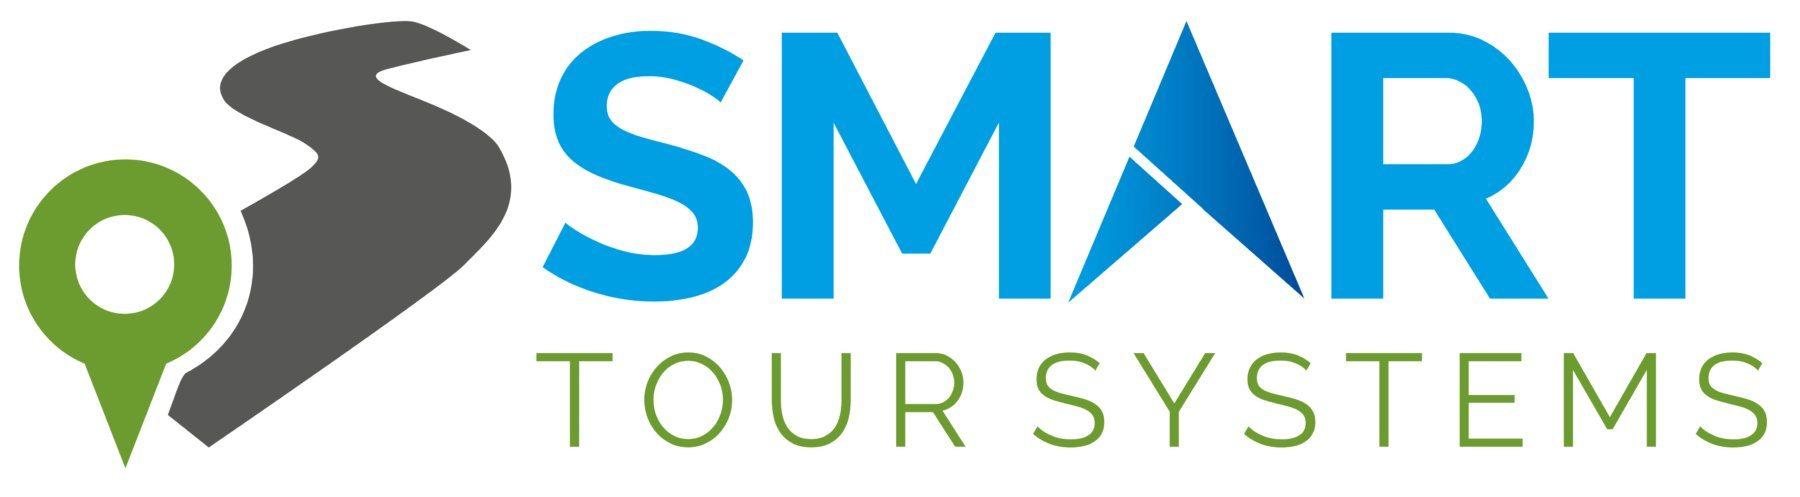 Smart Tour Systems